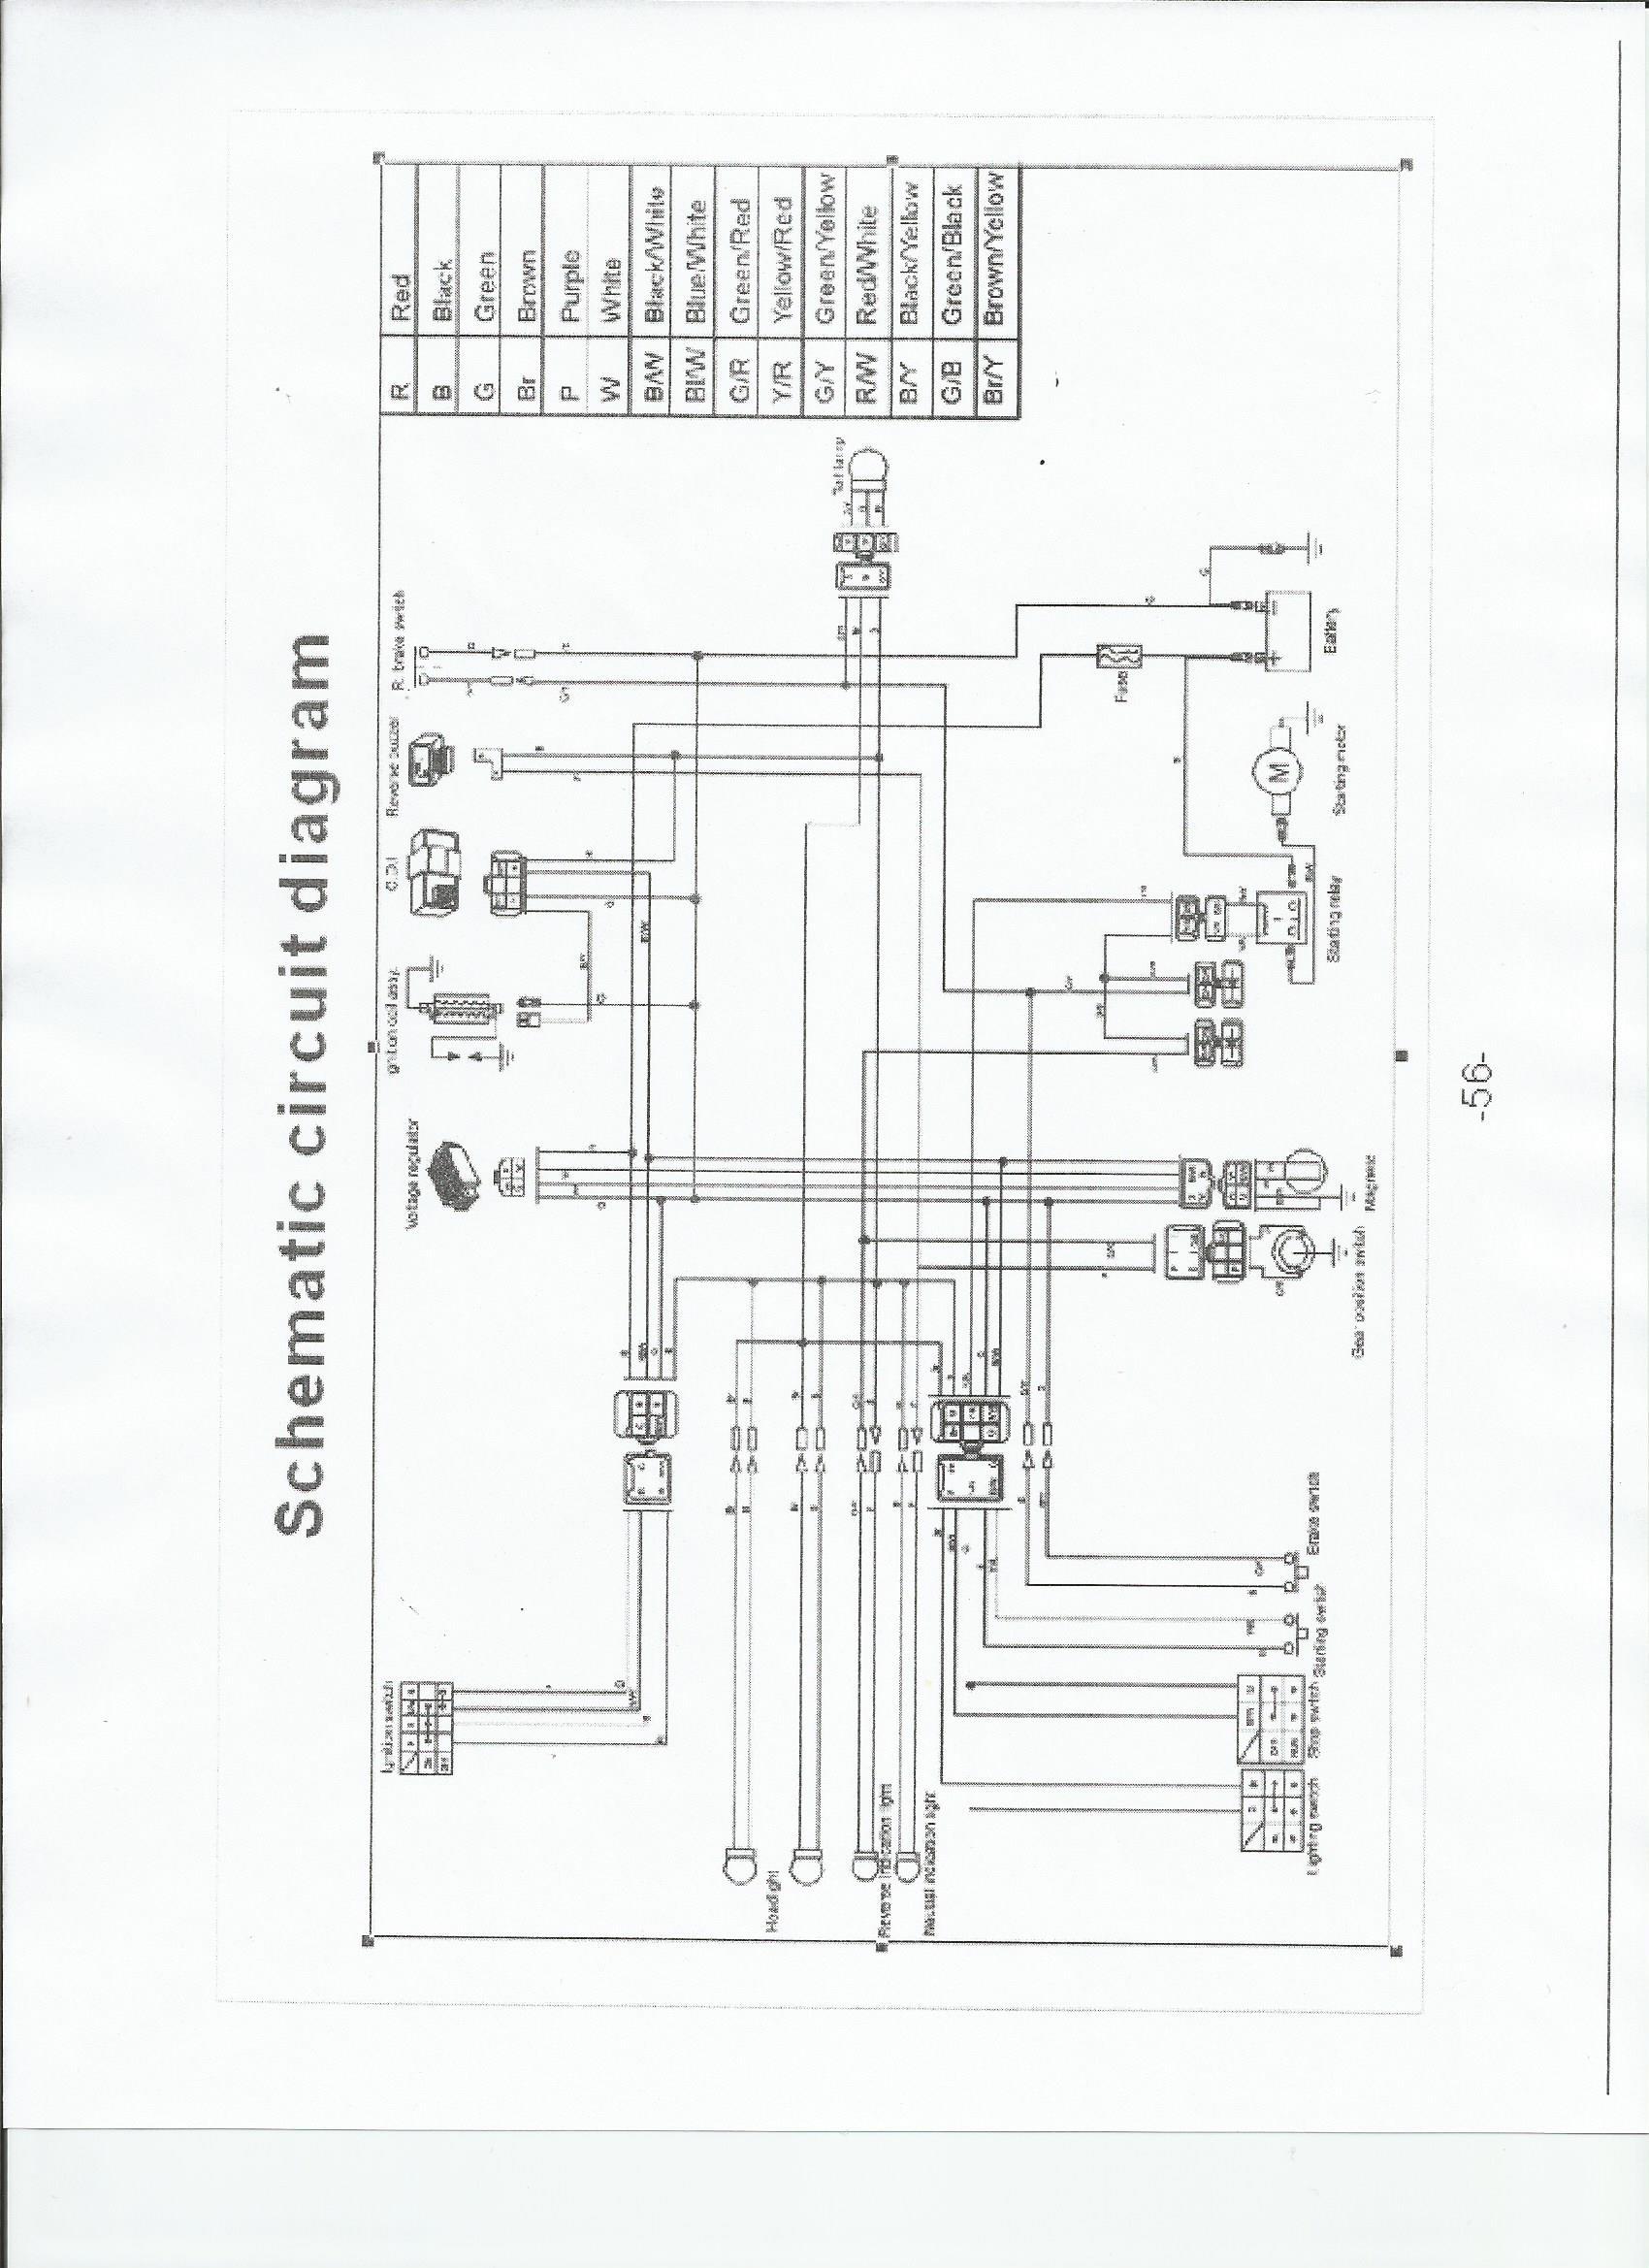 redcat wiring diagram tao tao 50 wiring diagram e1 wiring diagram  tao tao 50 wiring diagram e1 wiring